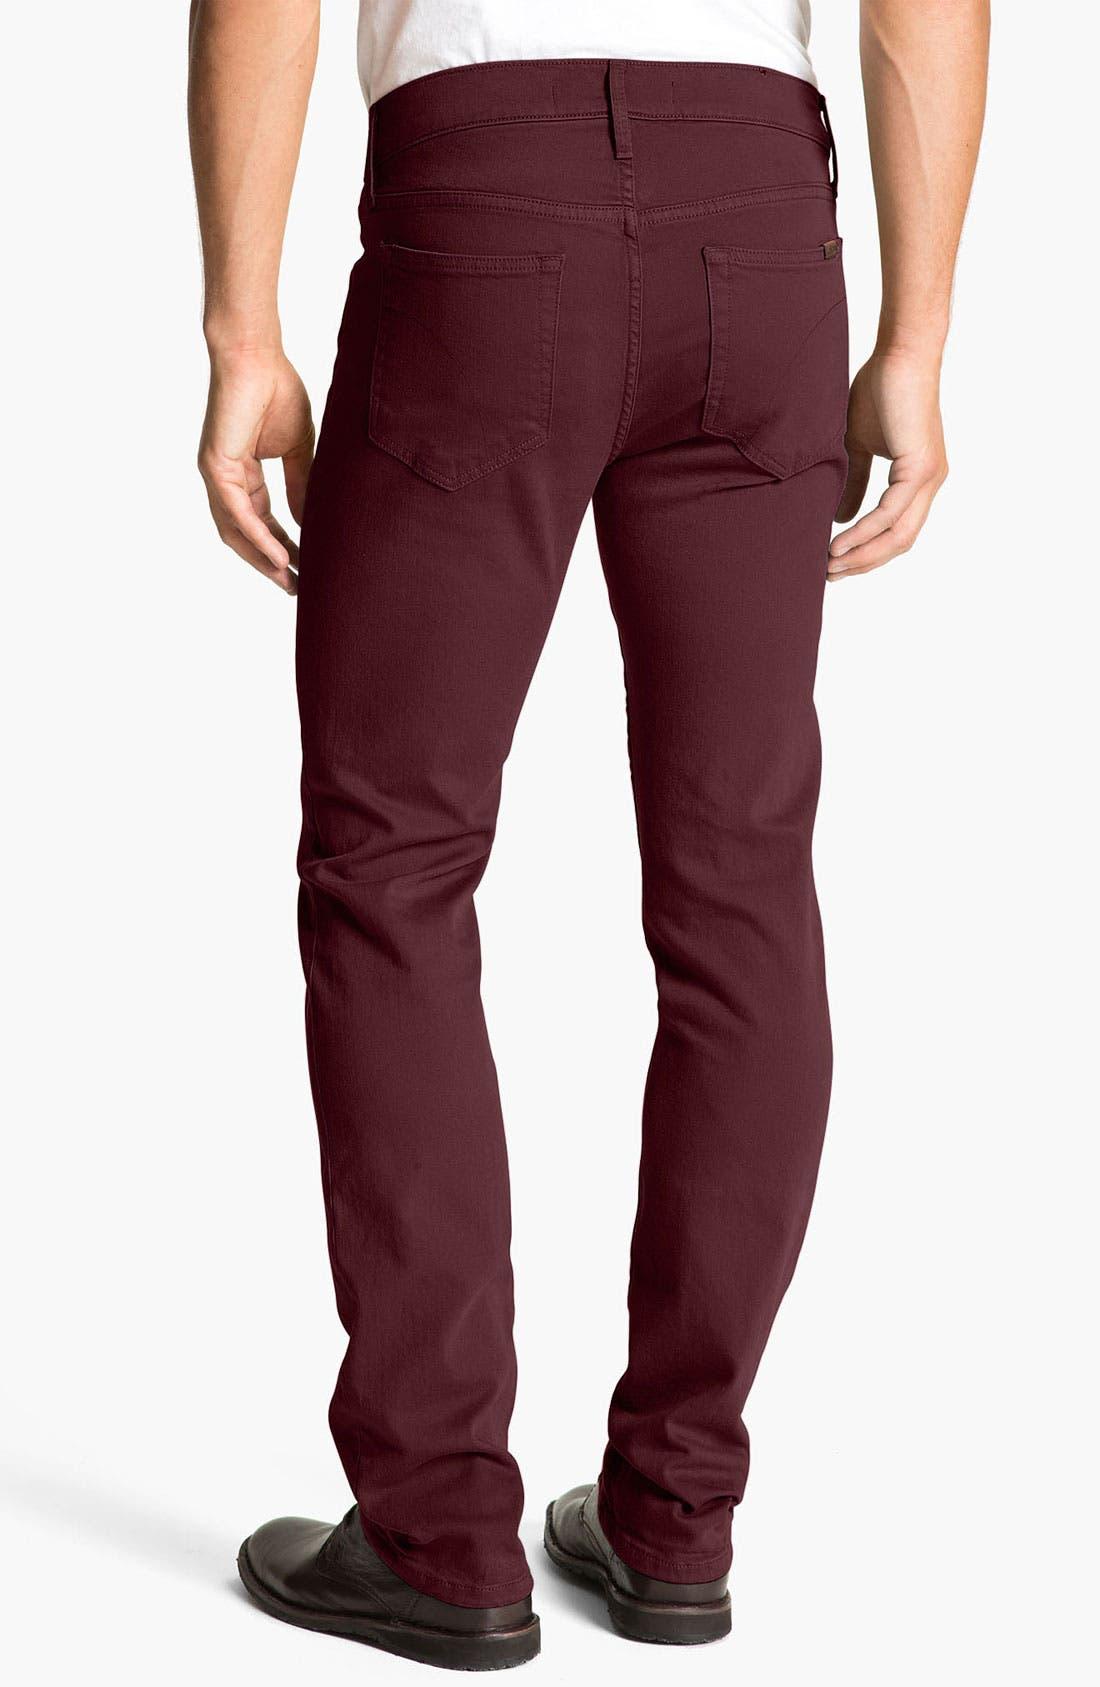 Alternate Image 1 Selected - Joe's 'Brixton' Slim Straight Leg Jeans (Bordeaux)